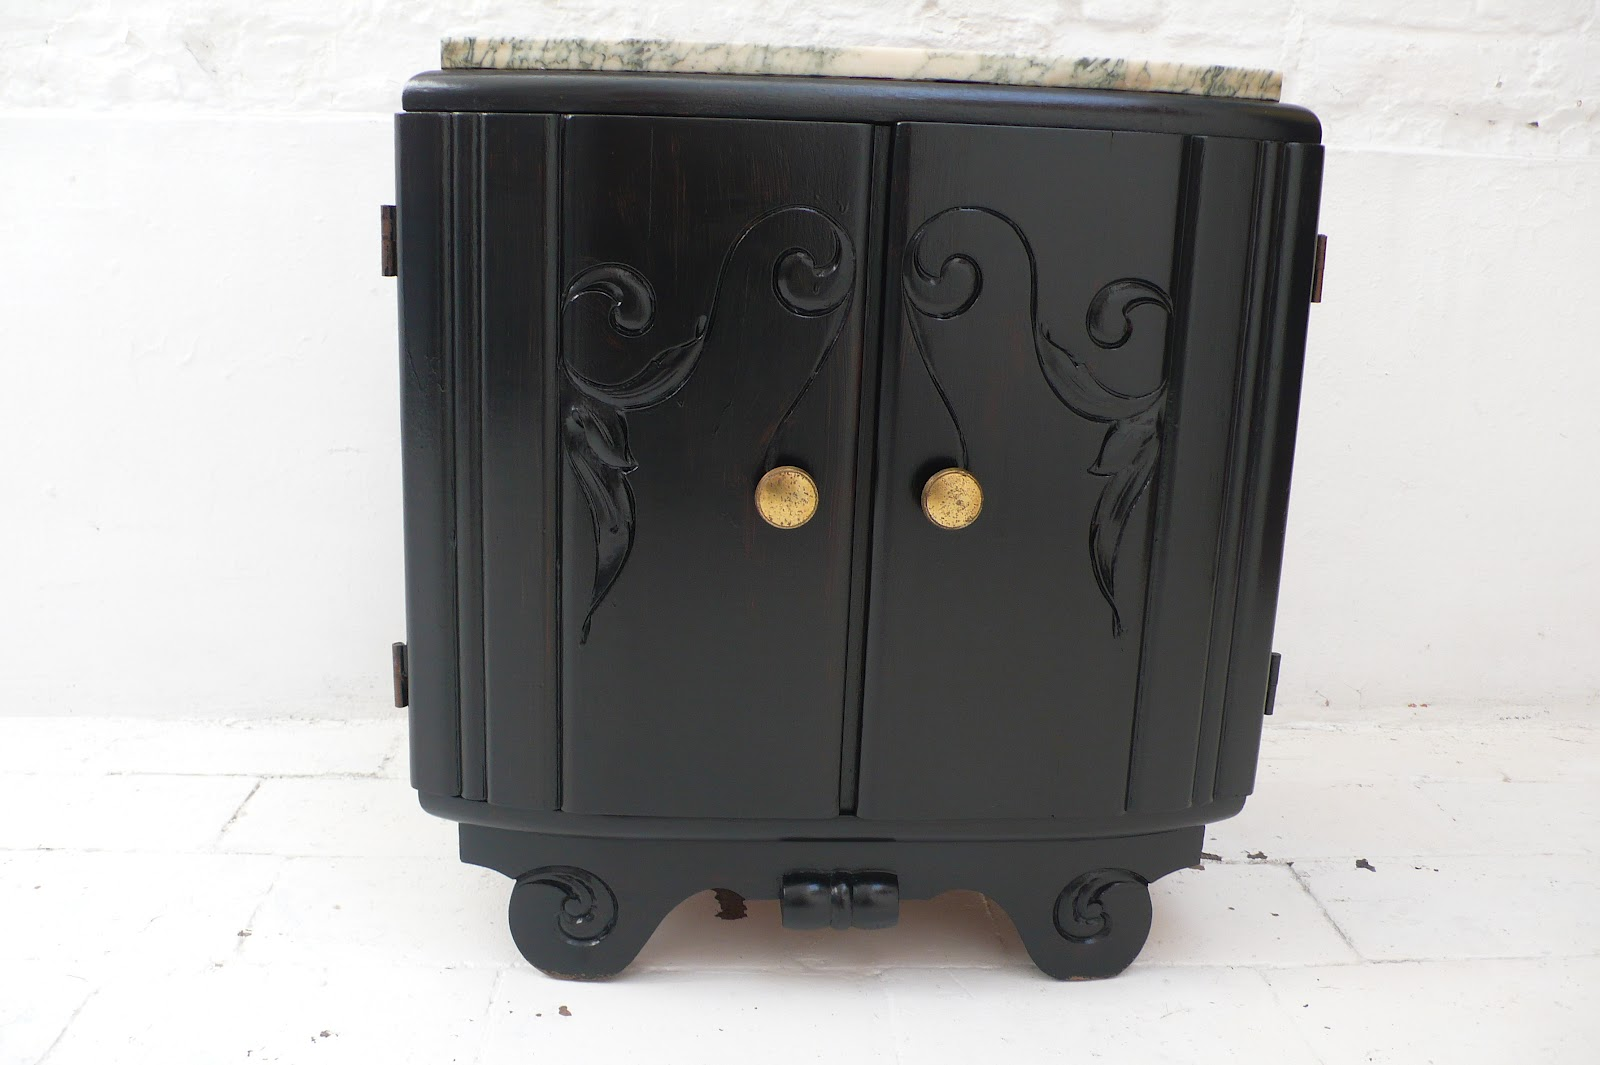 Meuble Tv Vintage Solde : Septembre 2012 – Bazar Vintage Bazar Brocante